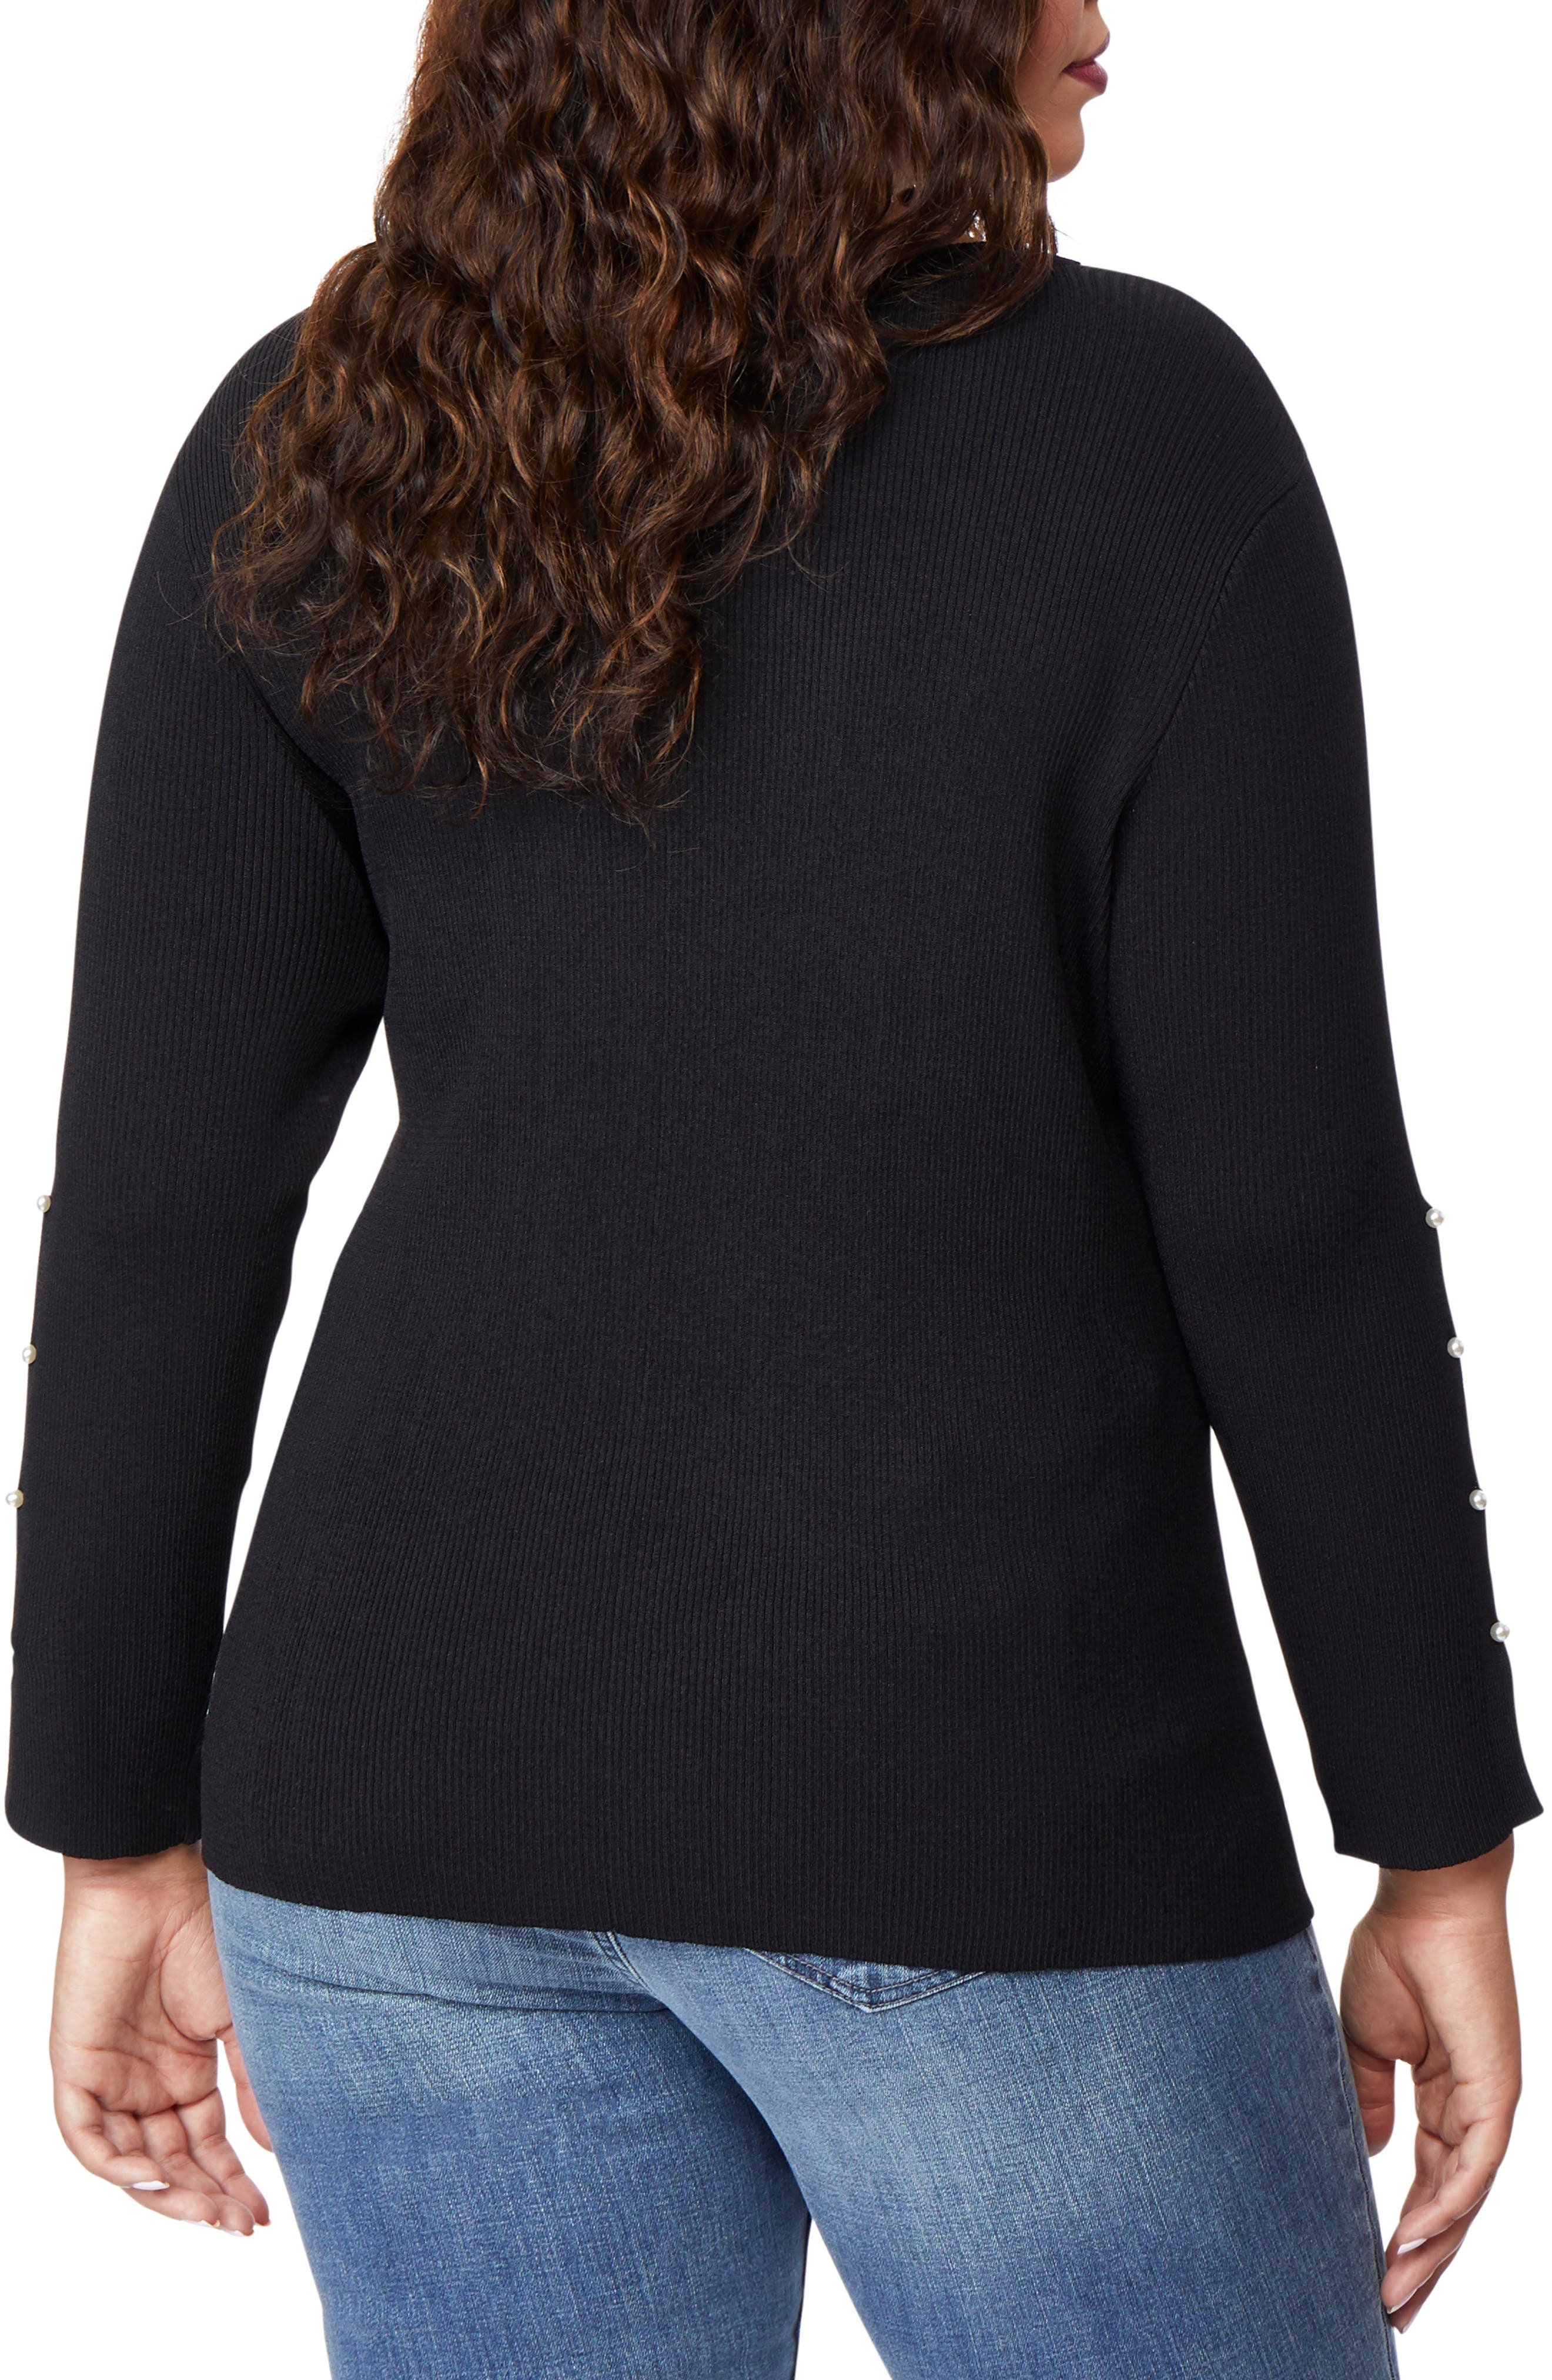 Beaded Sleeve Sweater,                             Alternate thumbnail 2, color,                             002